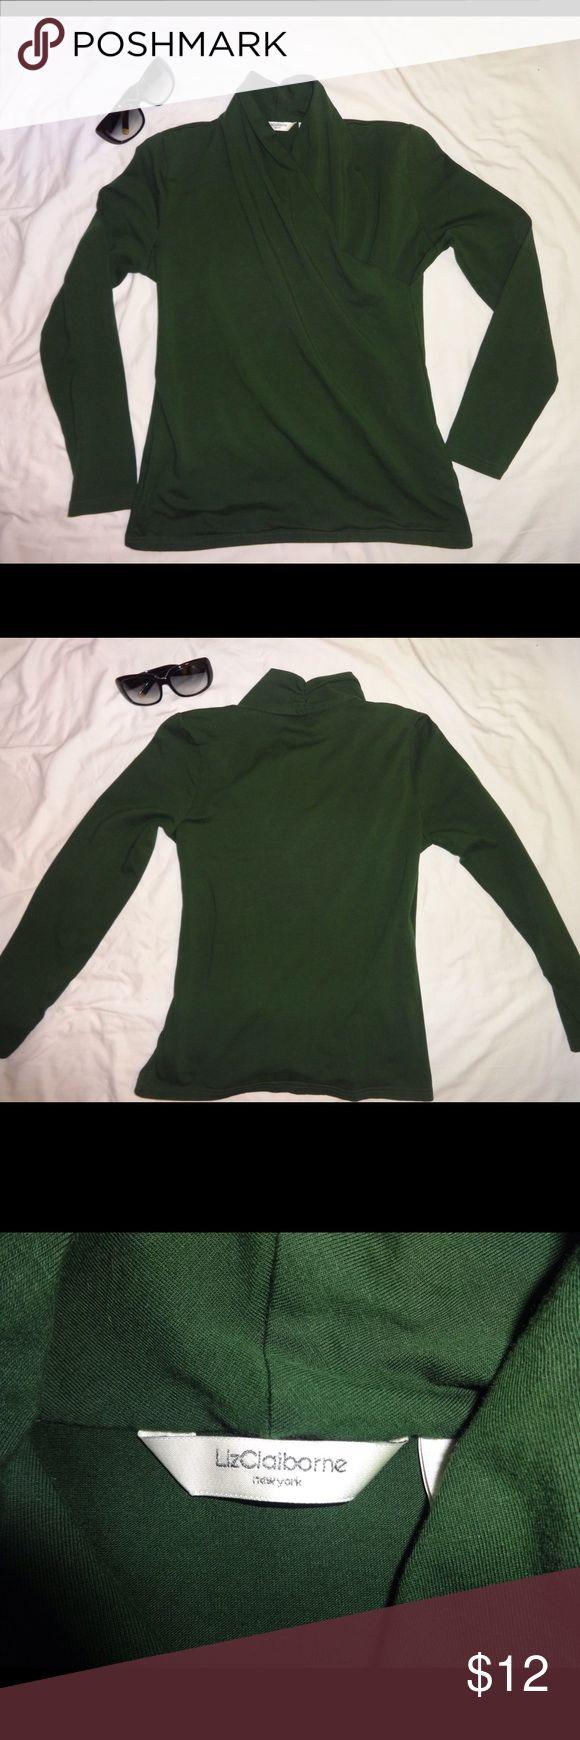 Liz Claiborne Long Sleeve Top Green, Liz Claiborne, mock wrap, long sleeve top. Gently used. No flaws. Liz Claiborne Tops